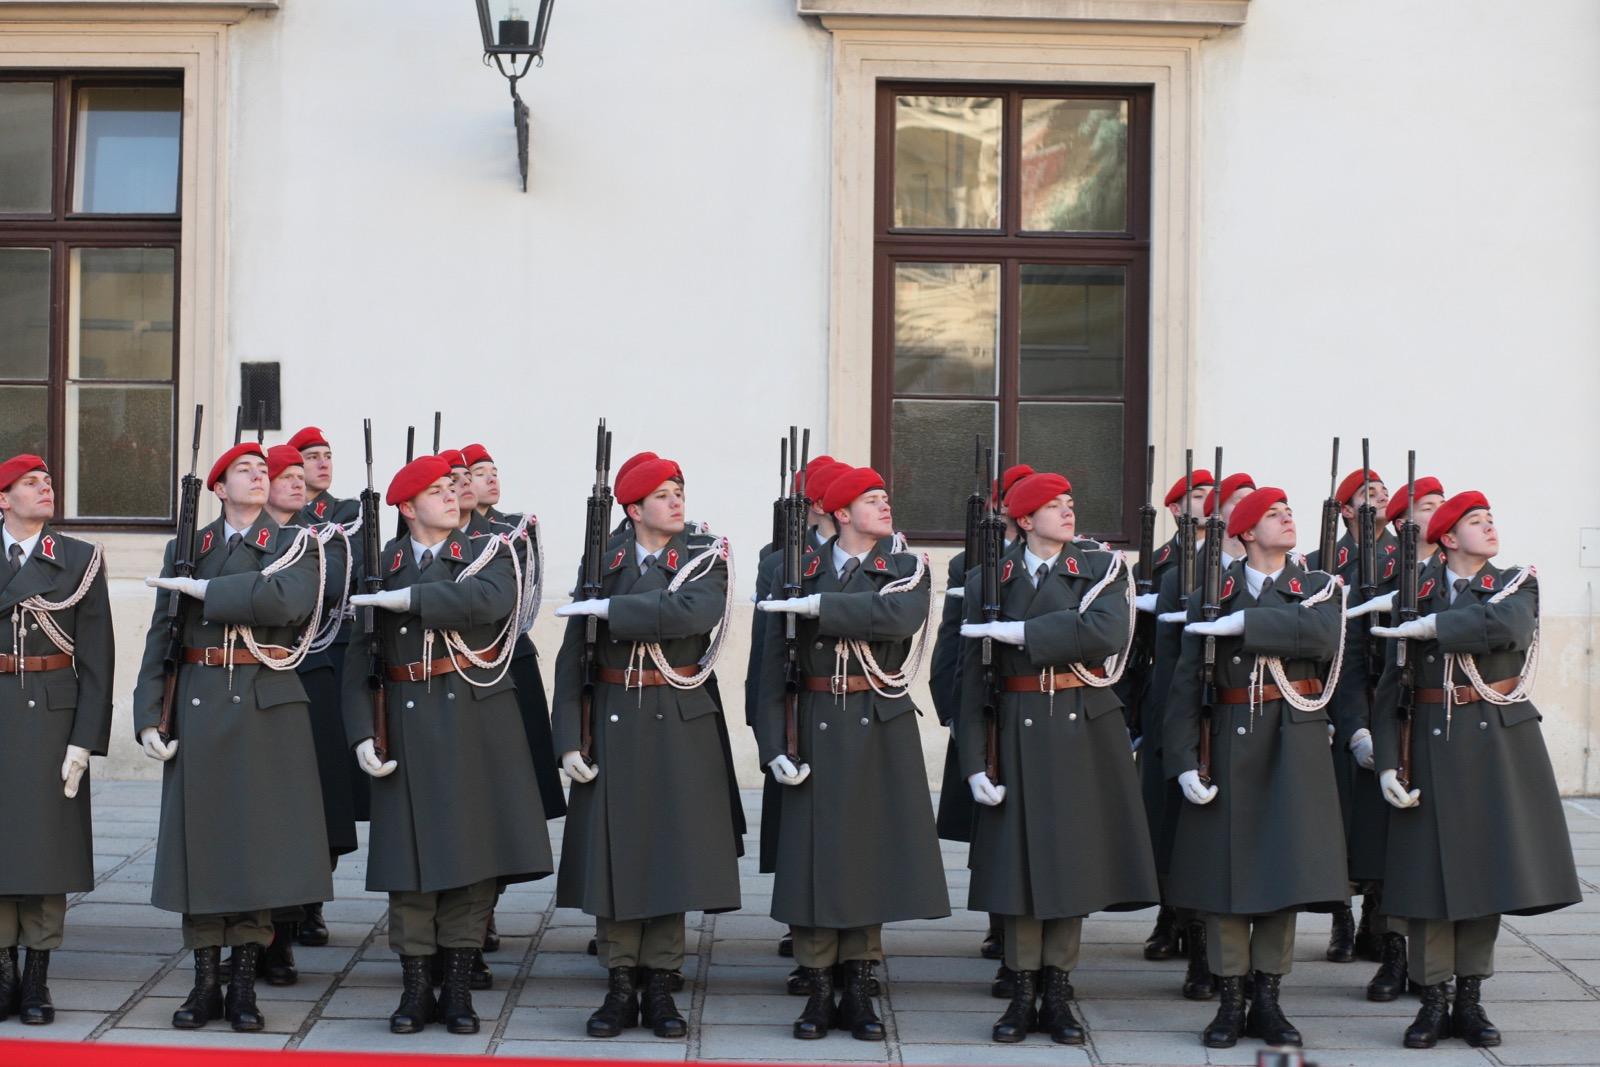 2019_01_11_1Gardekompanie_HBP_SUI_Präsident_Schweiz_Burghof - 30 of 36